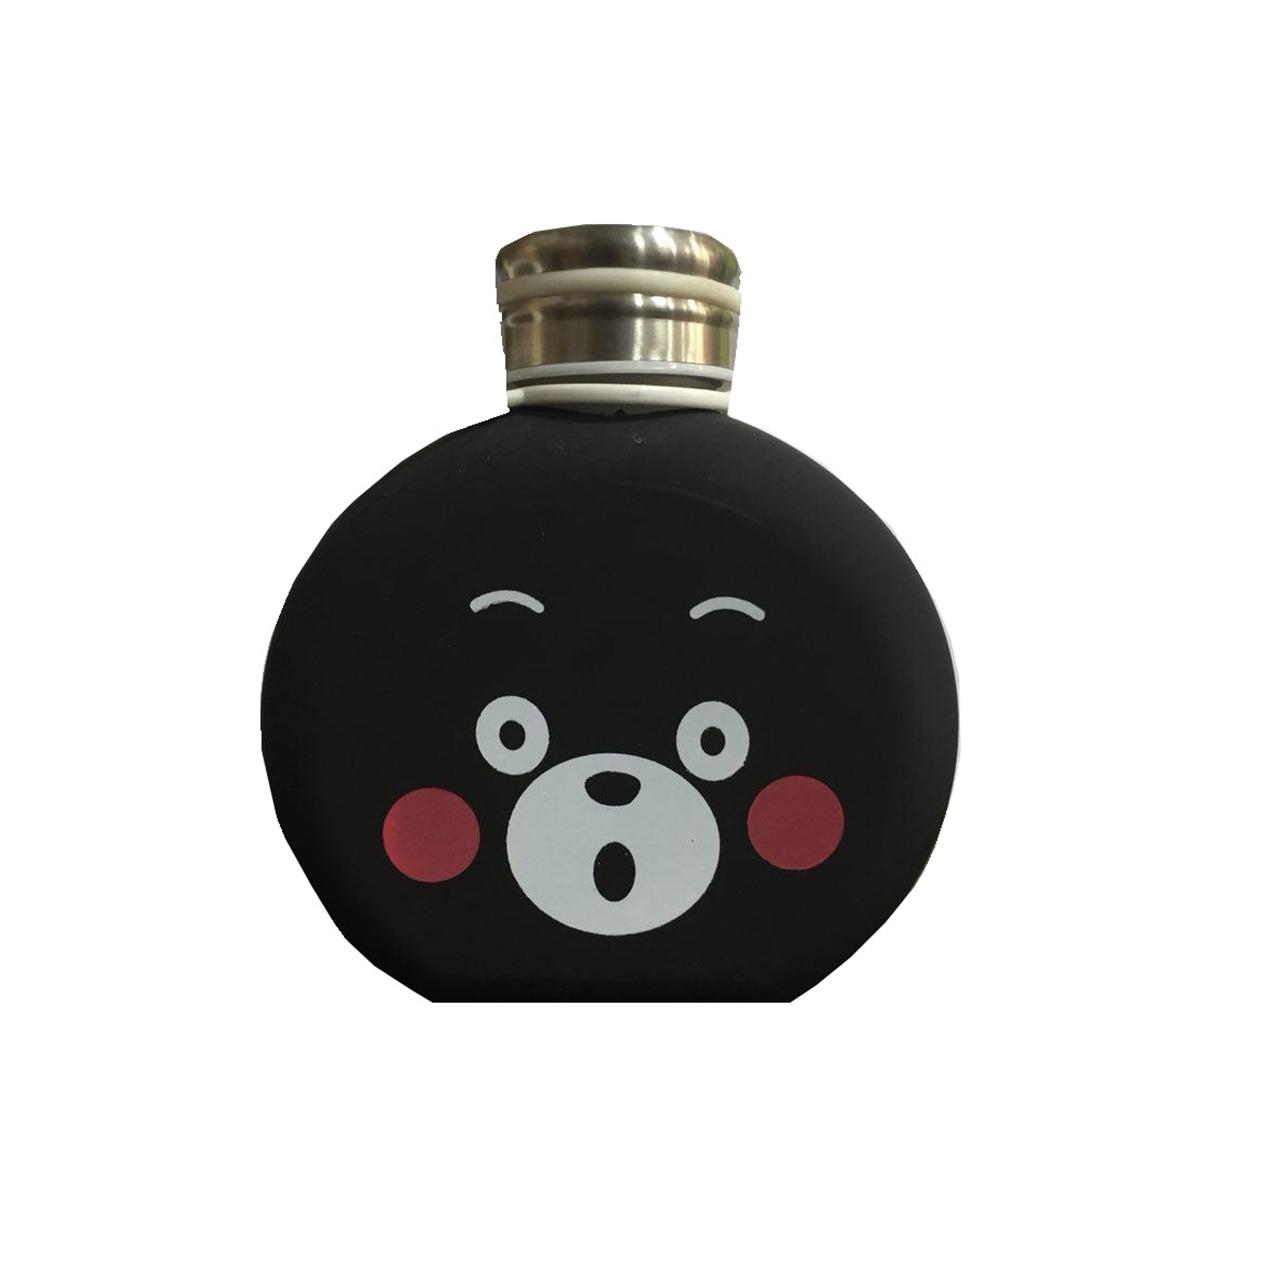 قمقمه آب ماین مدل Black Bear ظرفیت 500 میلی لیتر